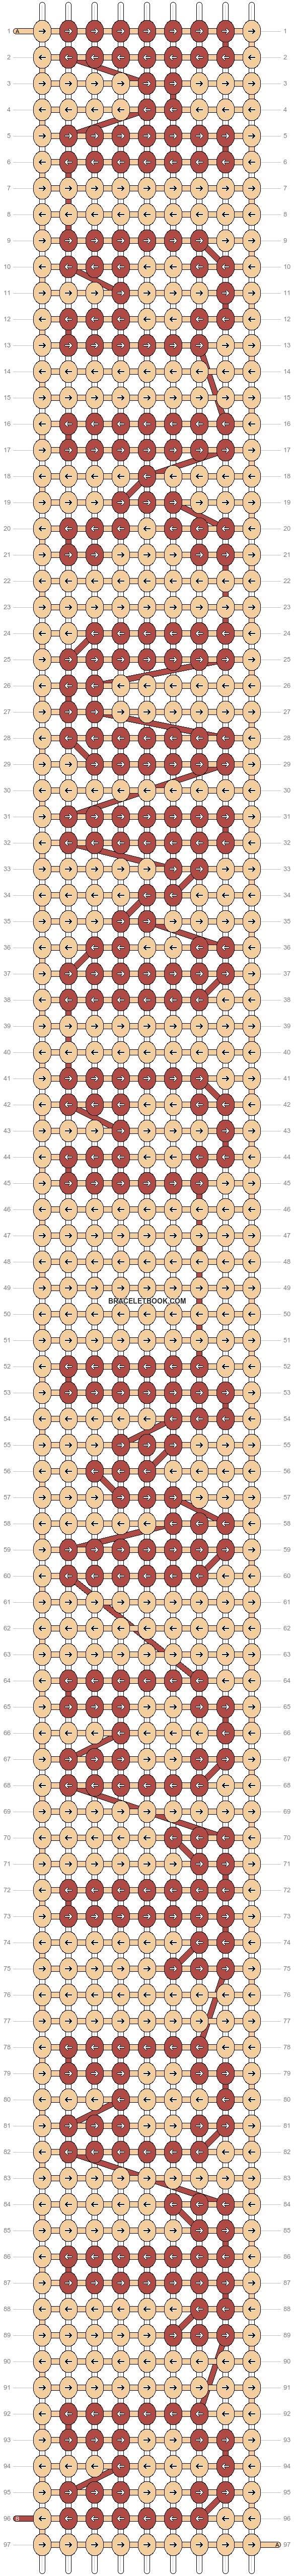 Alpha pattern #2471 pattern